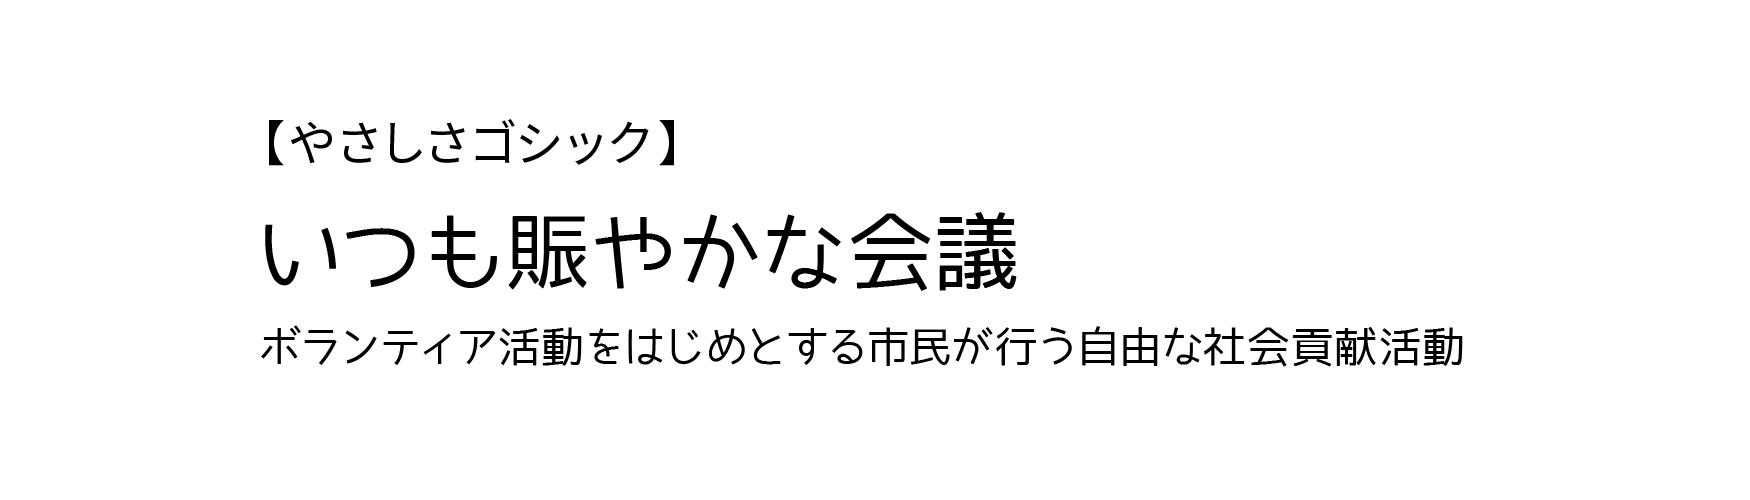 170508image630x360_sumple_yasashisa